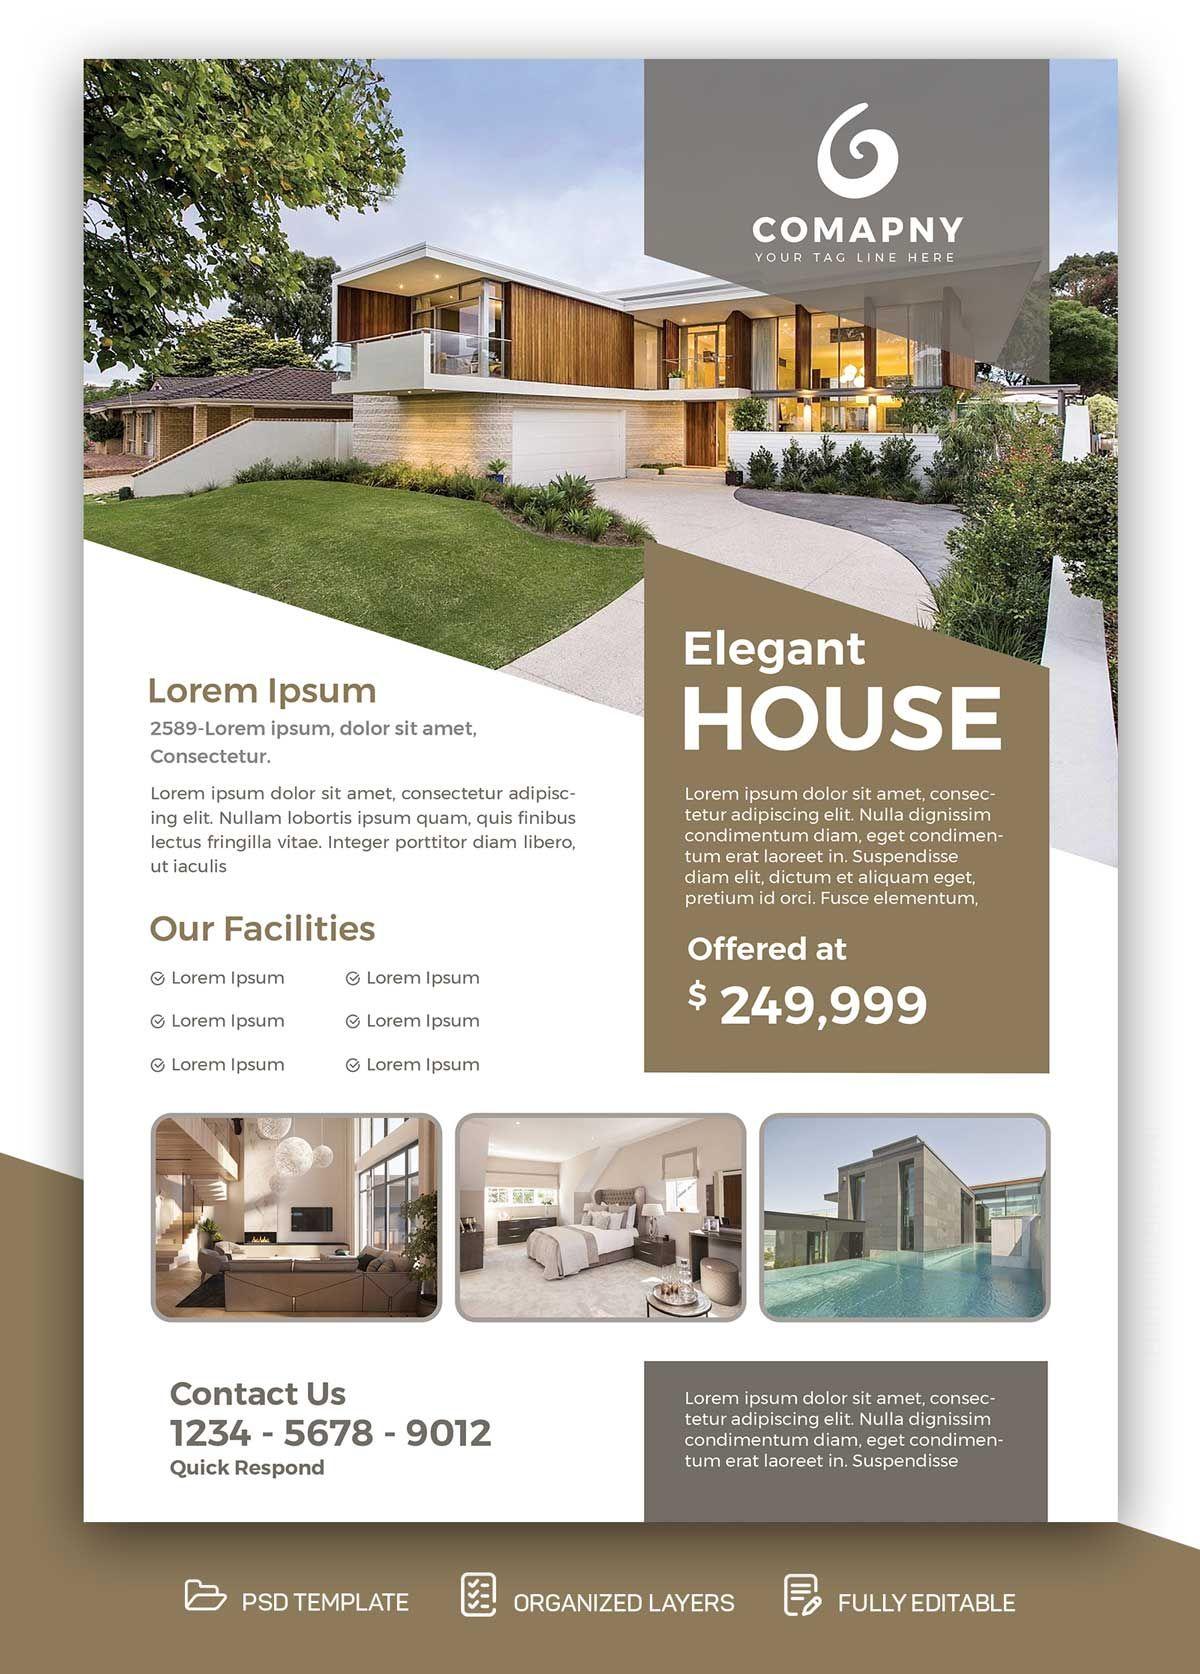 Properties For Sale Real Estate Free Psd Flyer Flyer Design Layout Free Psd Flyer Real Estate Marketing Design